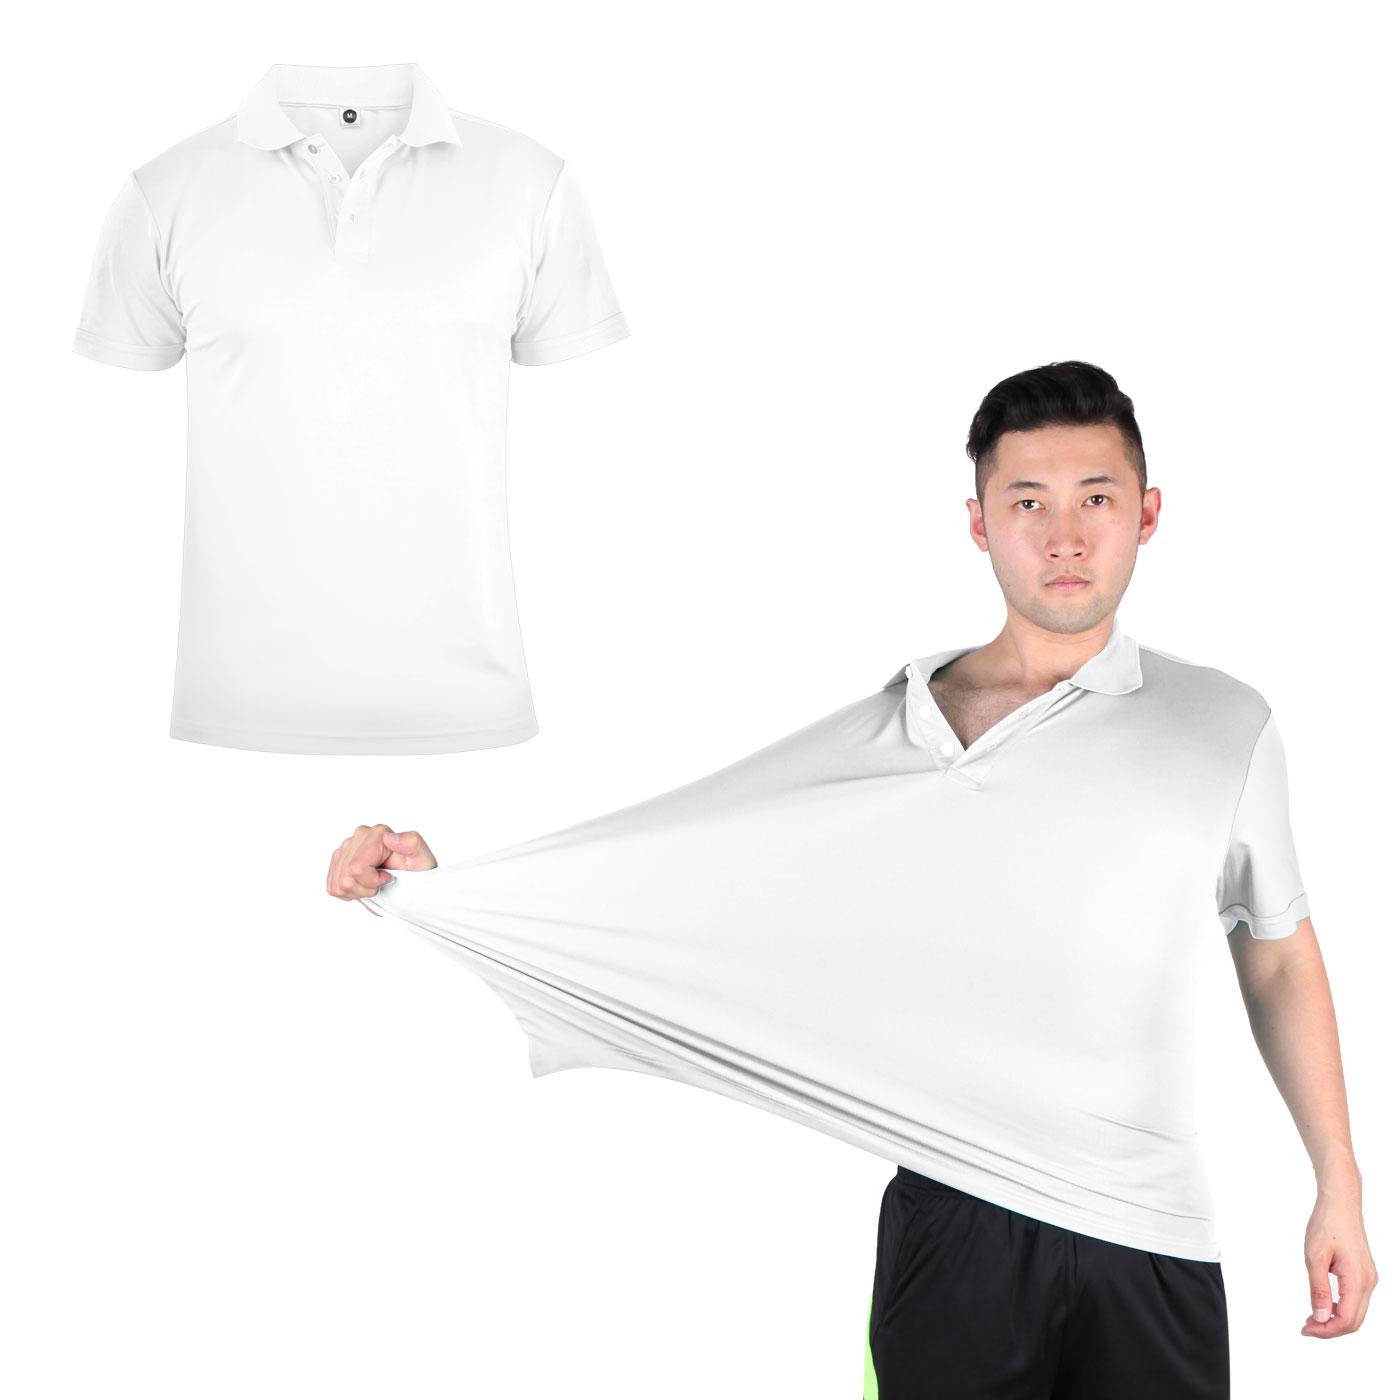 HODARLA 彈力涼感短袖POLO衫 3113901 - 白